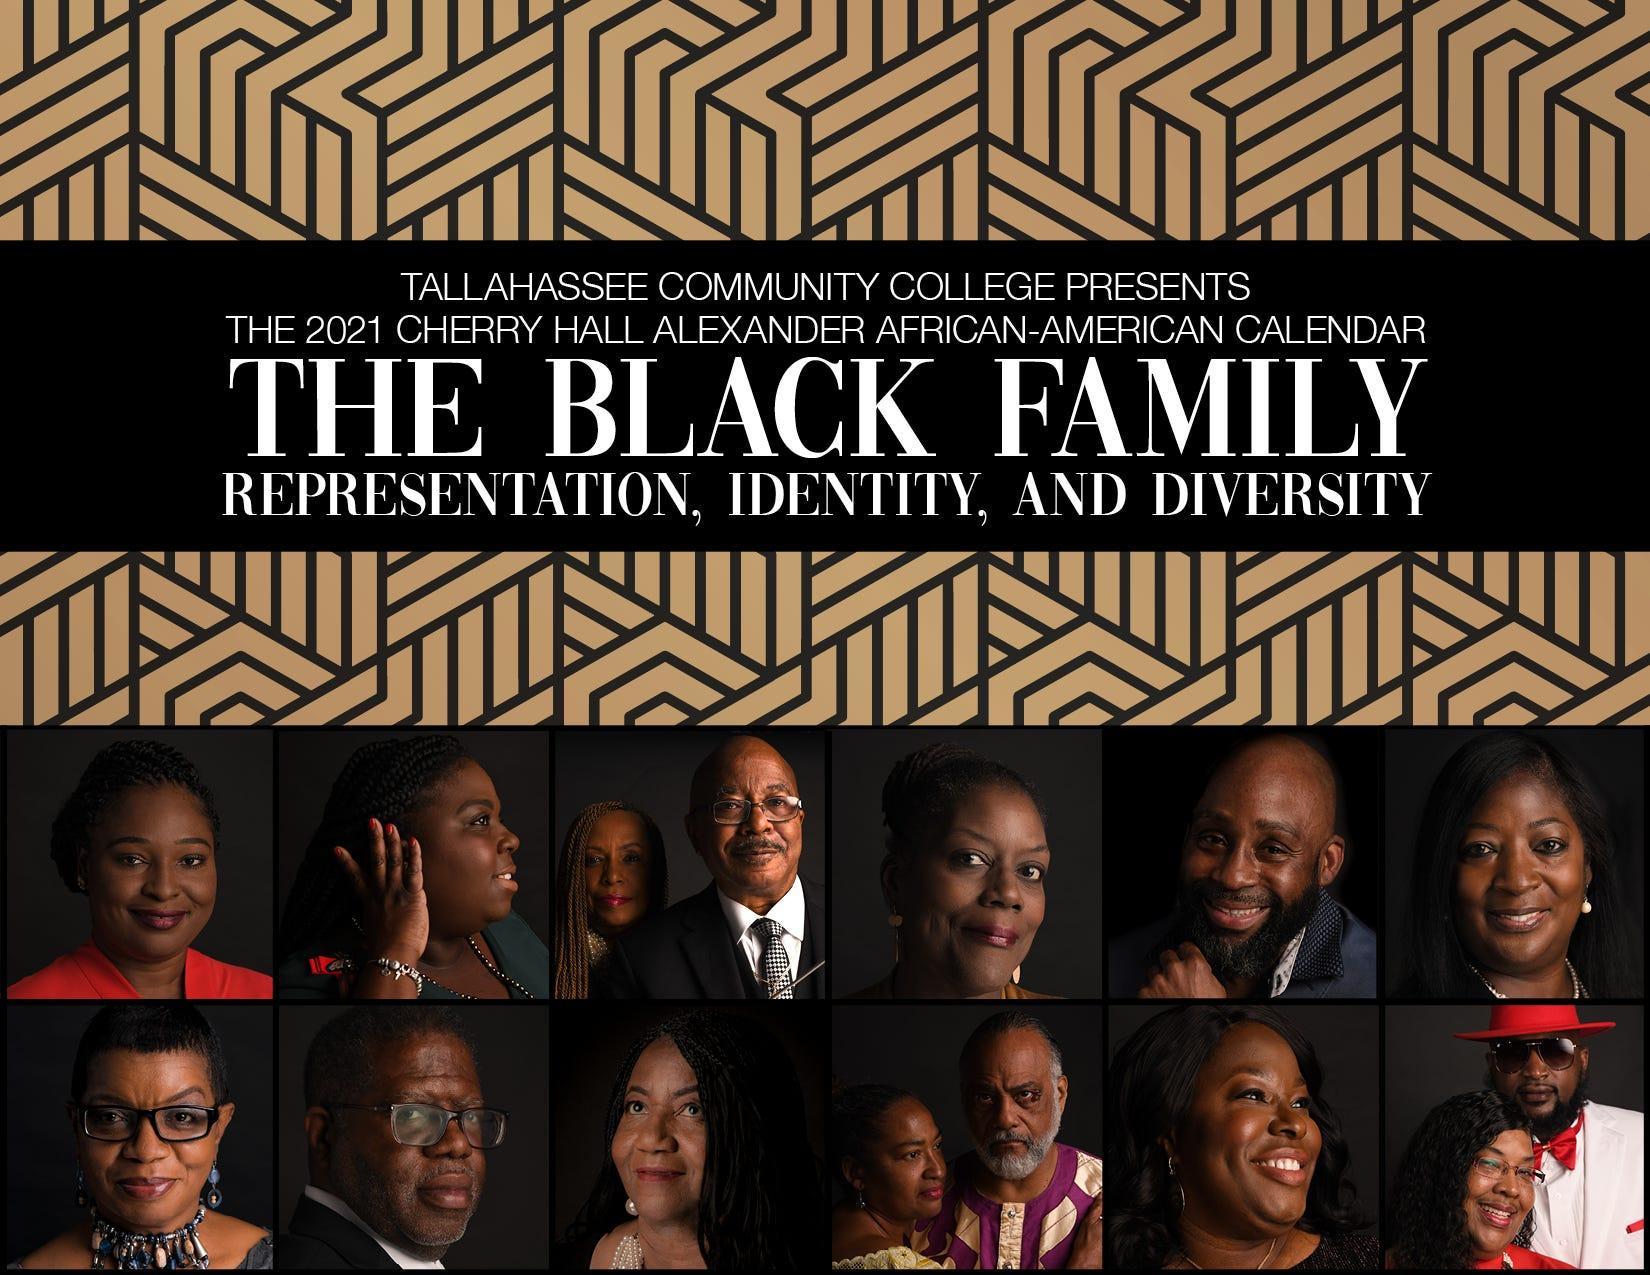 Tcc Calendar 2021 TCC unveils Cherry Hall Alexander African American History